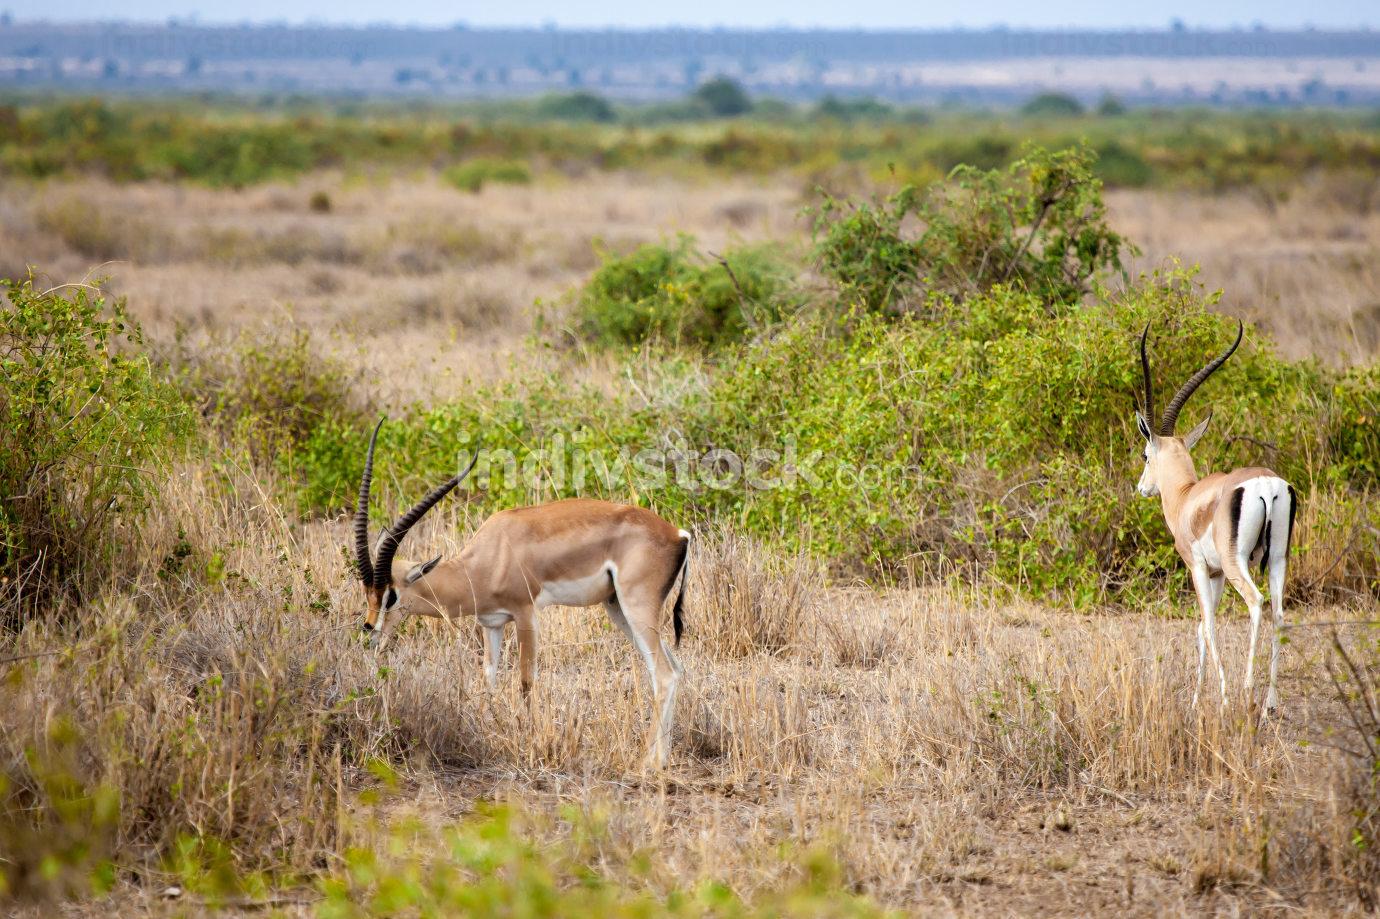 Two antelopes eating grass in the savannah of Kenya